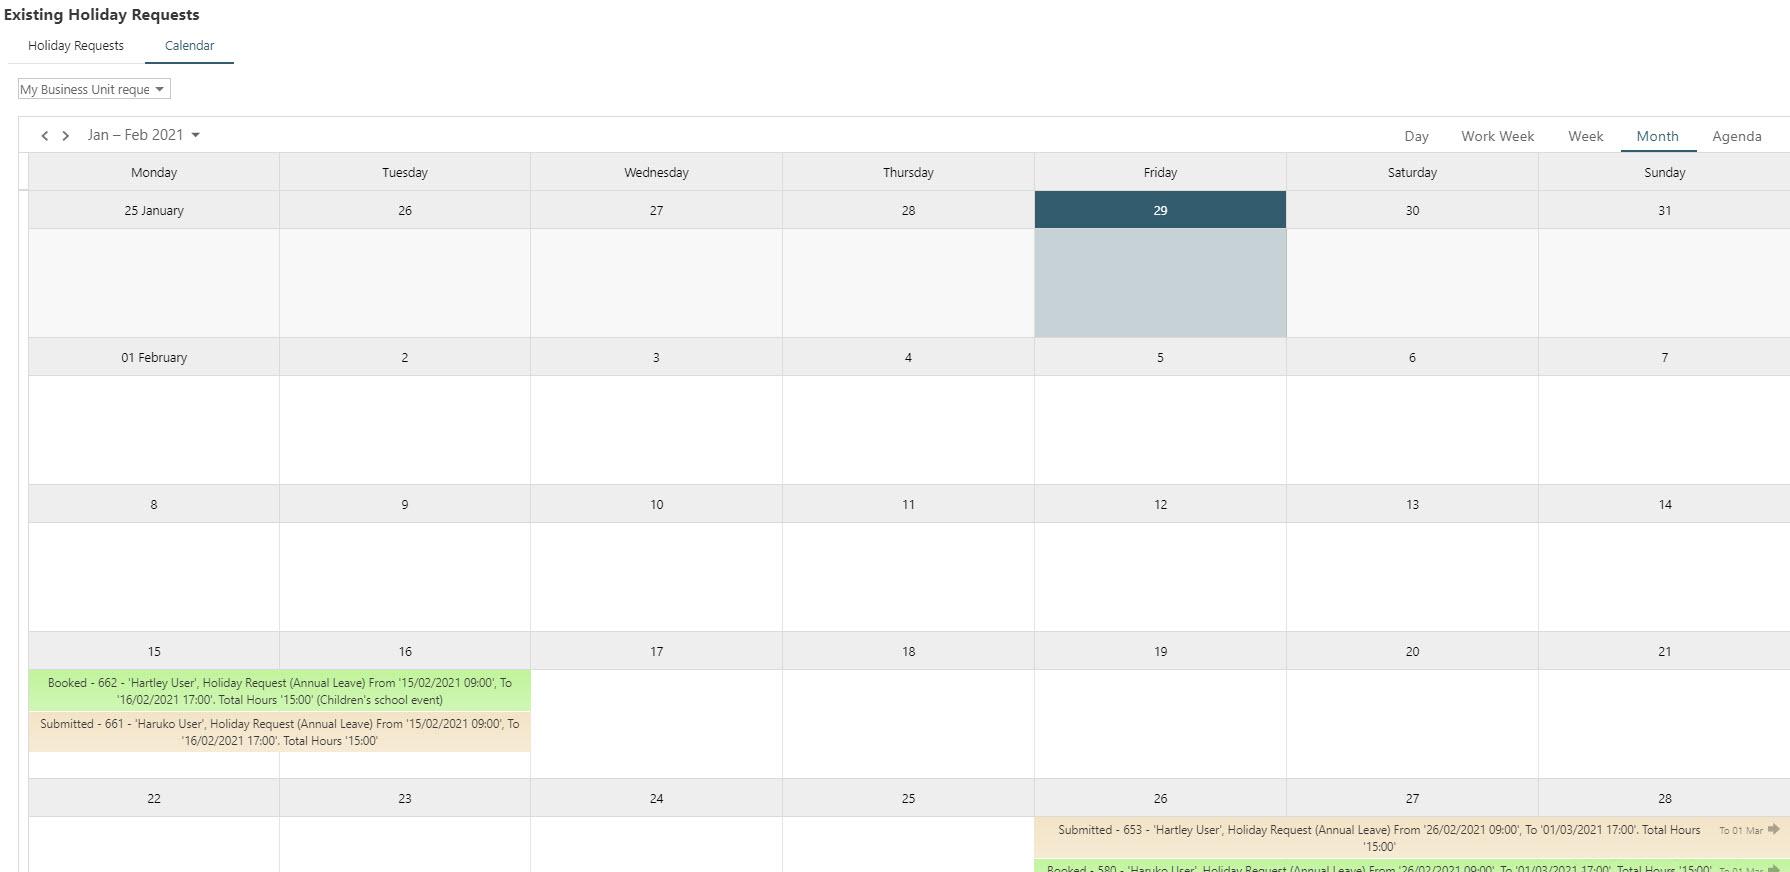 Sicon WAP Holidays Help and User Guide - WAP Holidays HUG Section 14 - Image 2